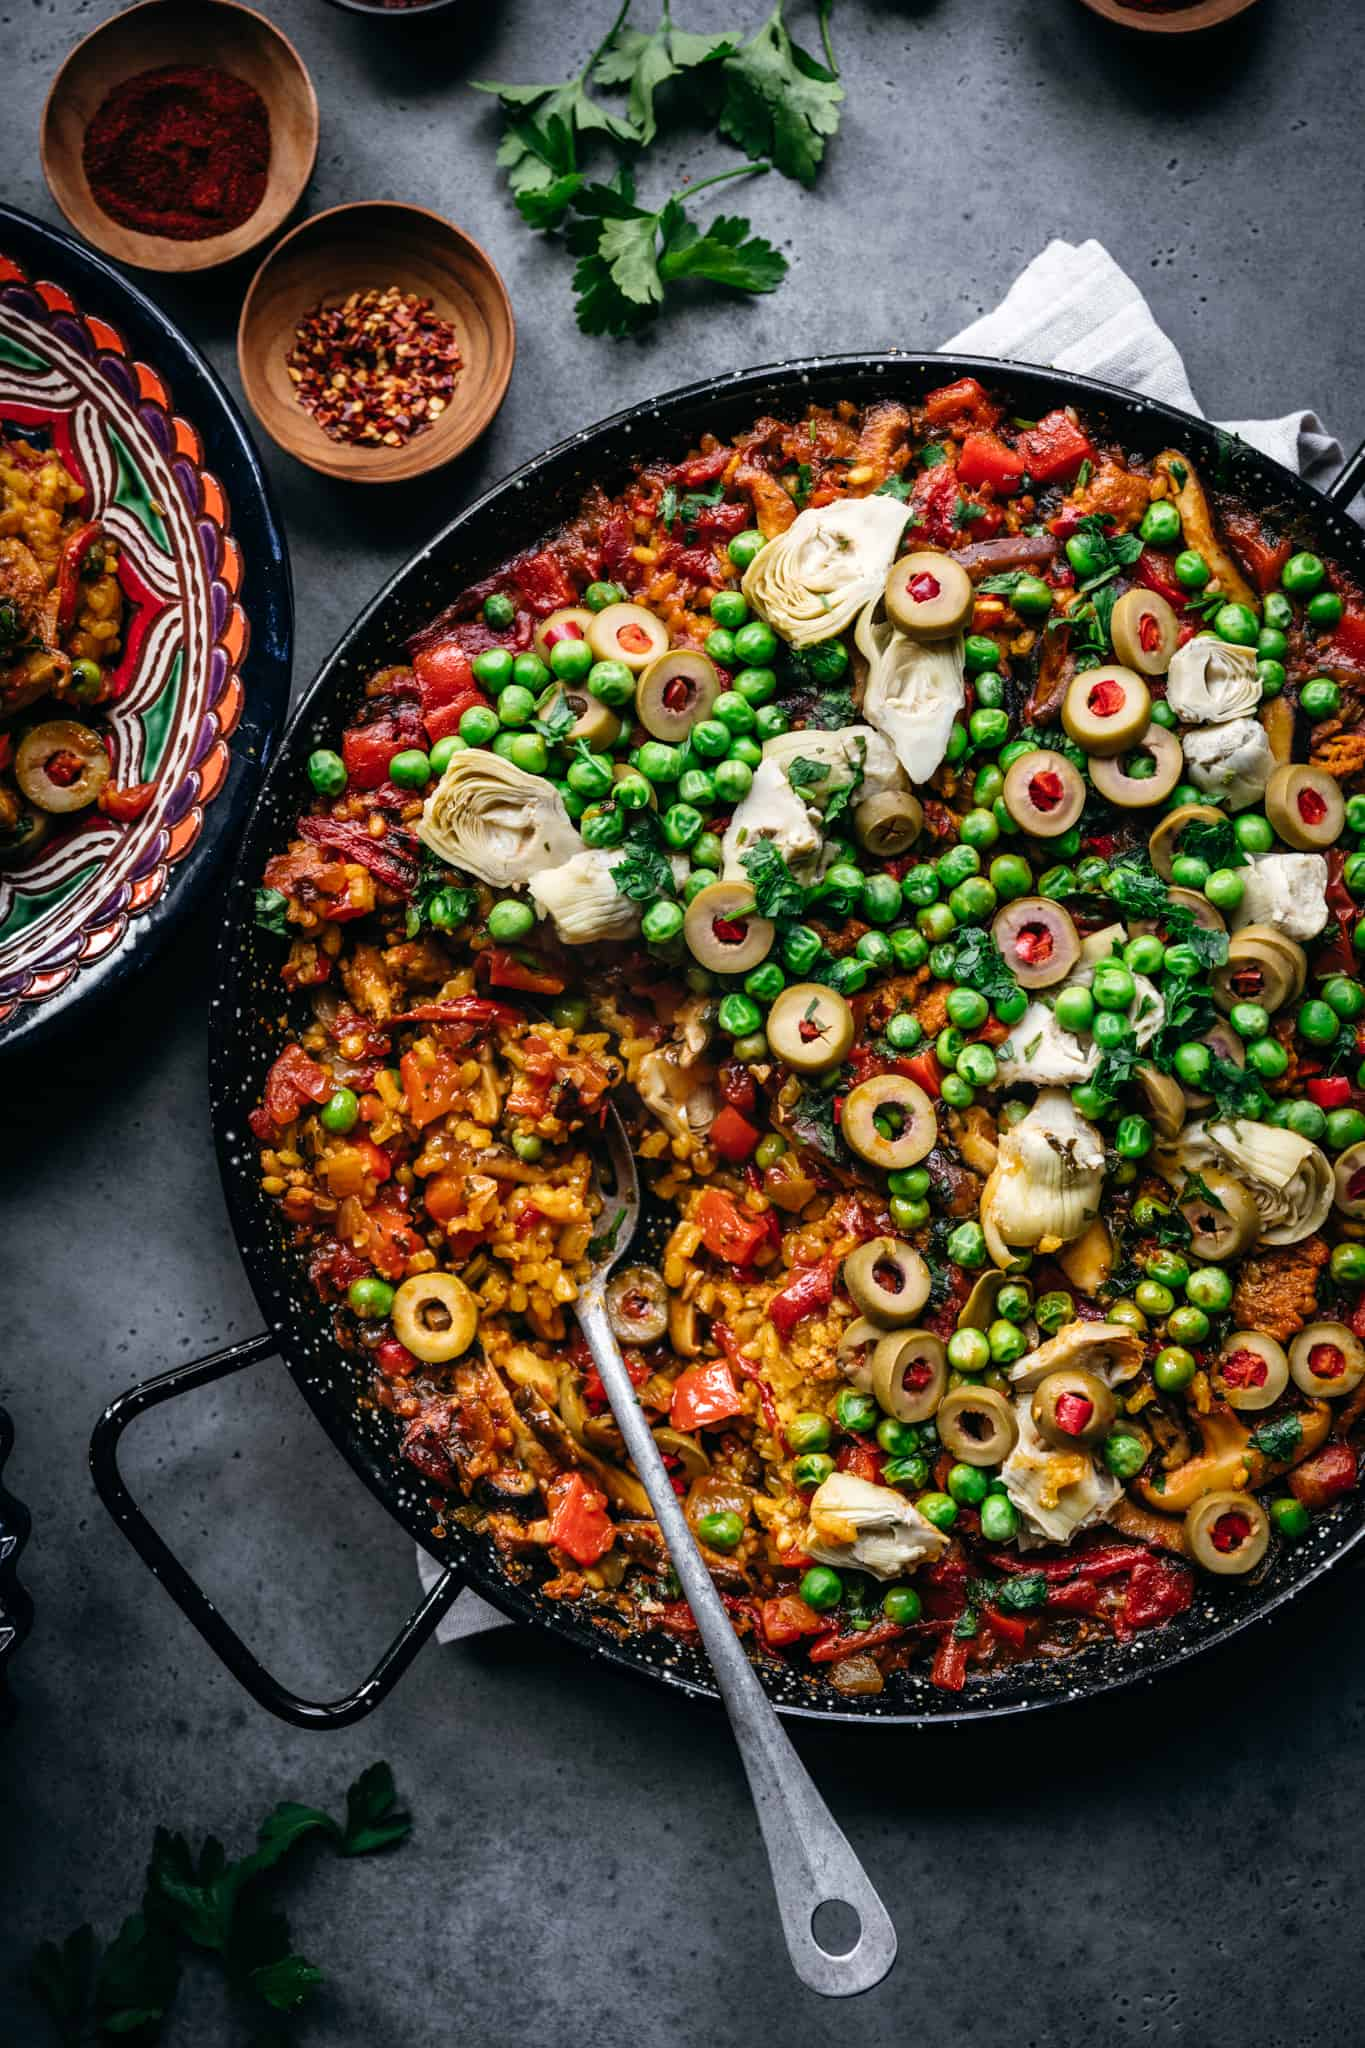 overhead view of vegan paella with peas, vegan chorizo, artichokes and olives